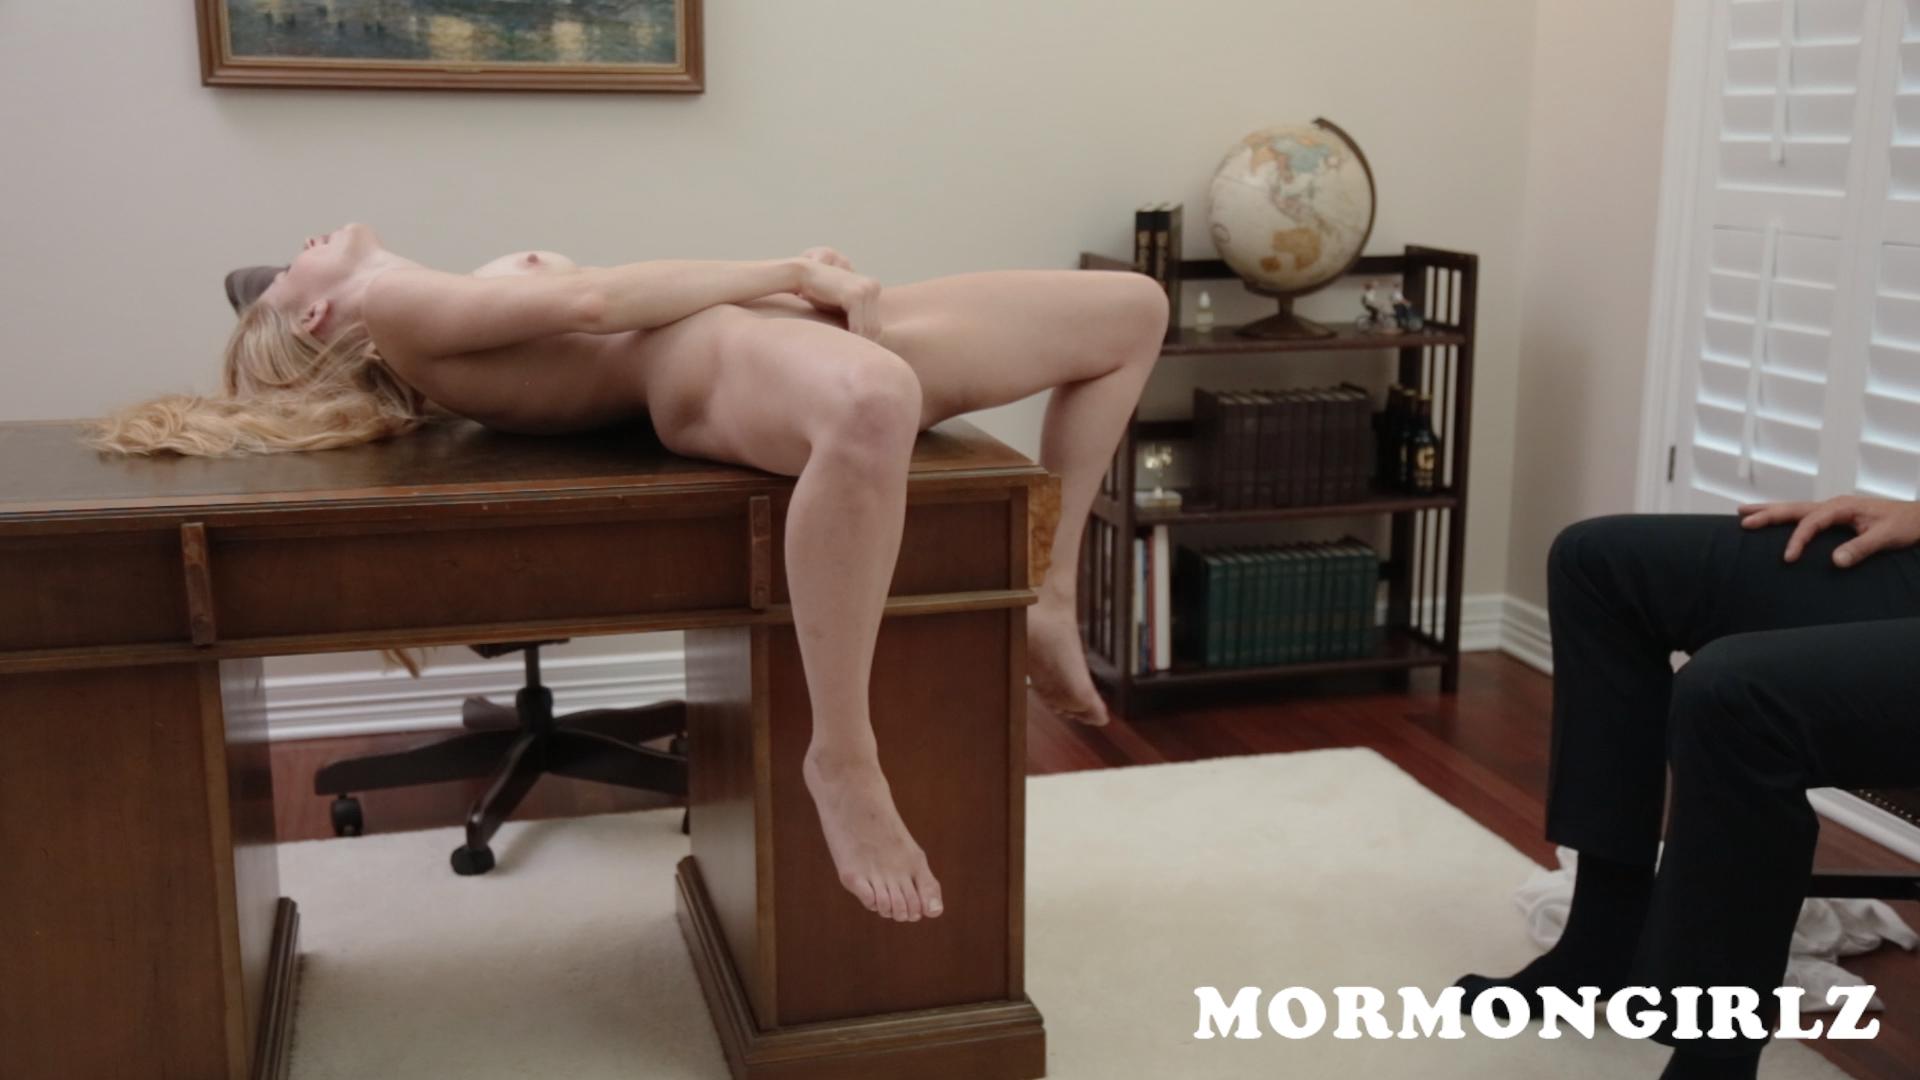 mormongirlz_70b_19